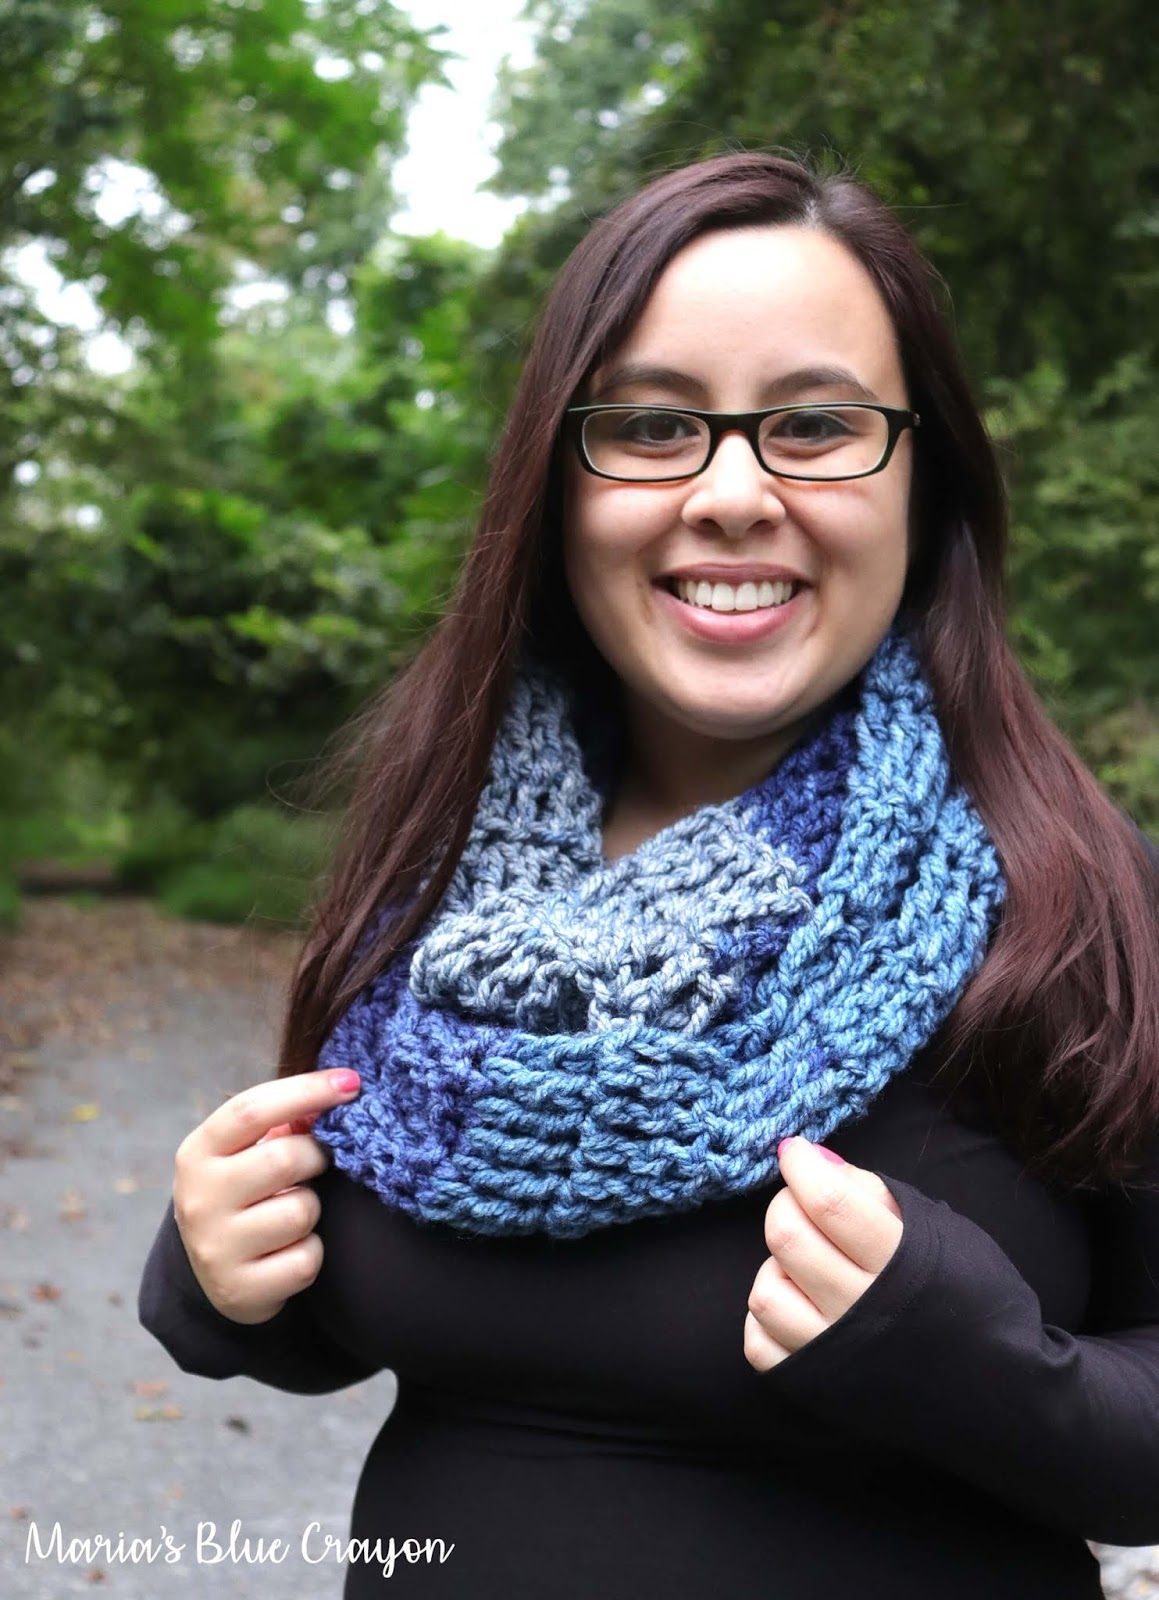 Crocheting Infinity Scarf Patterns